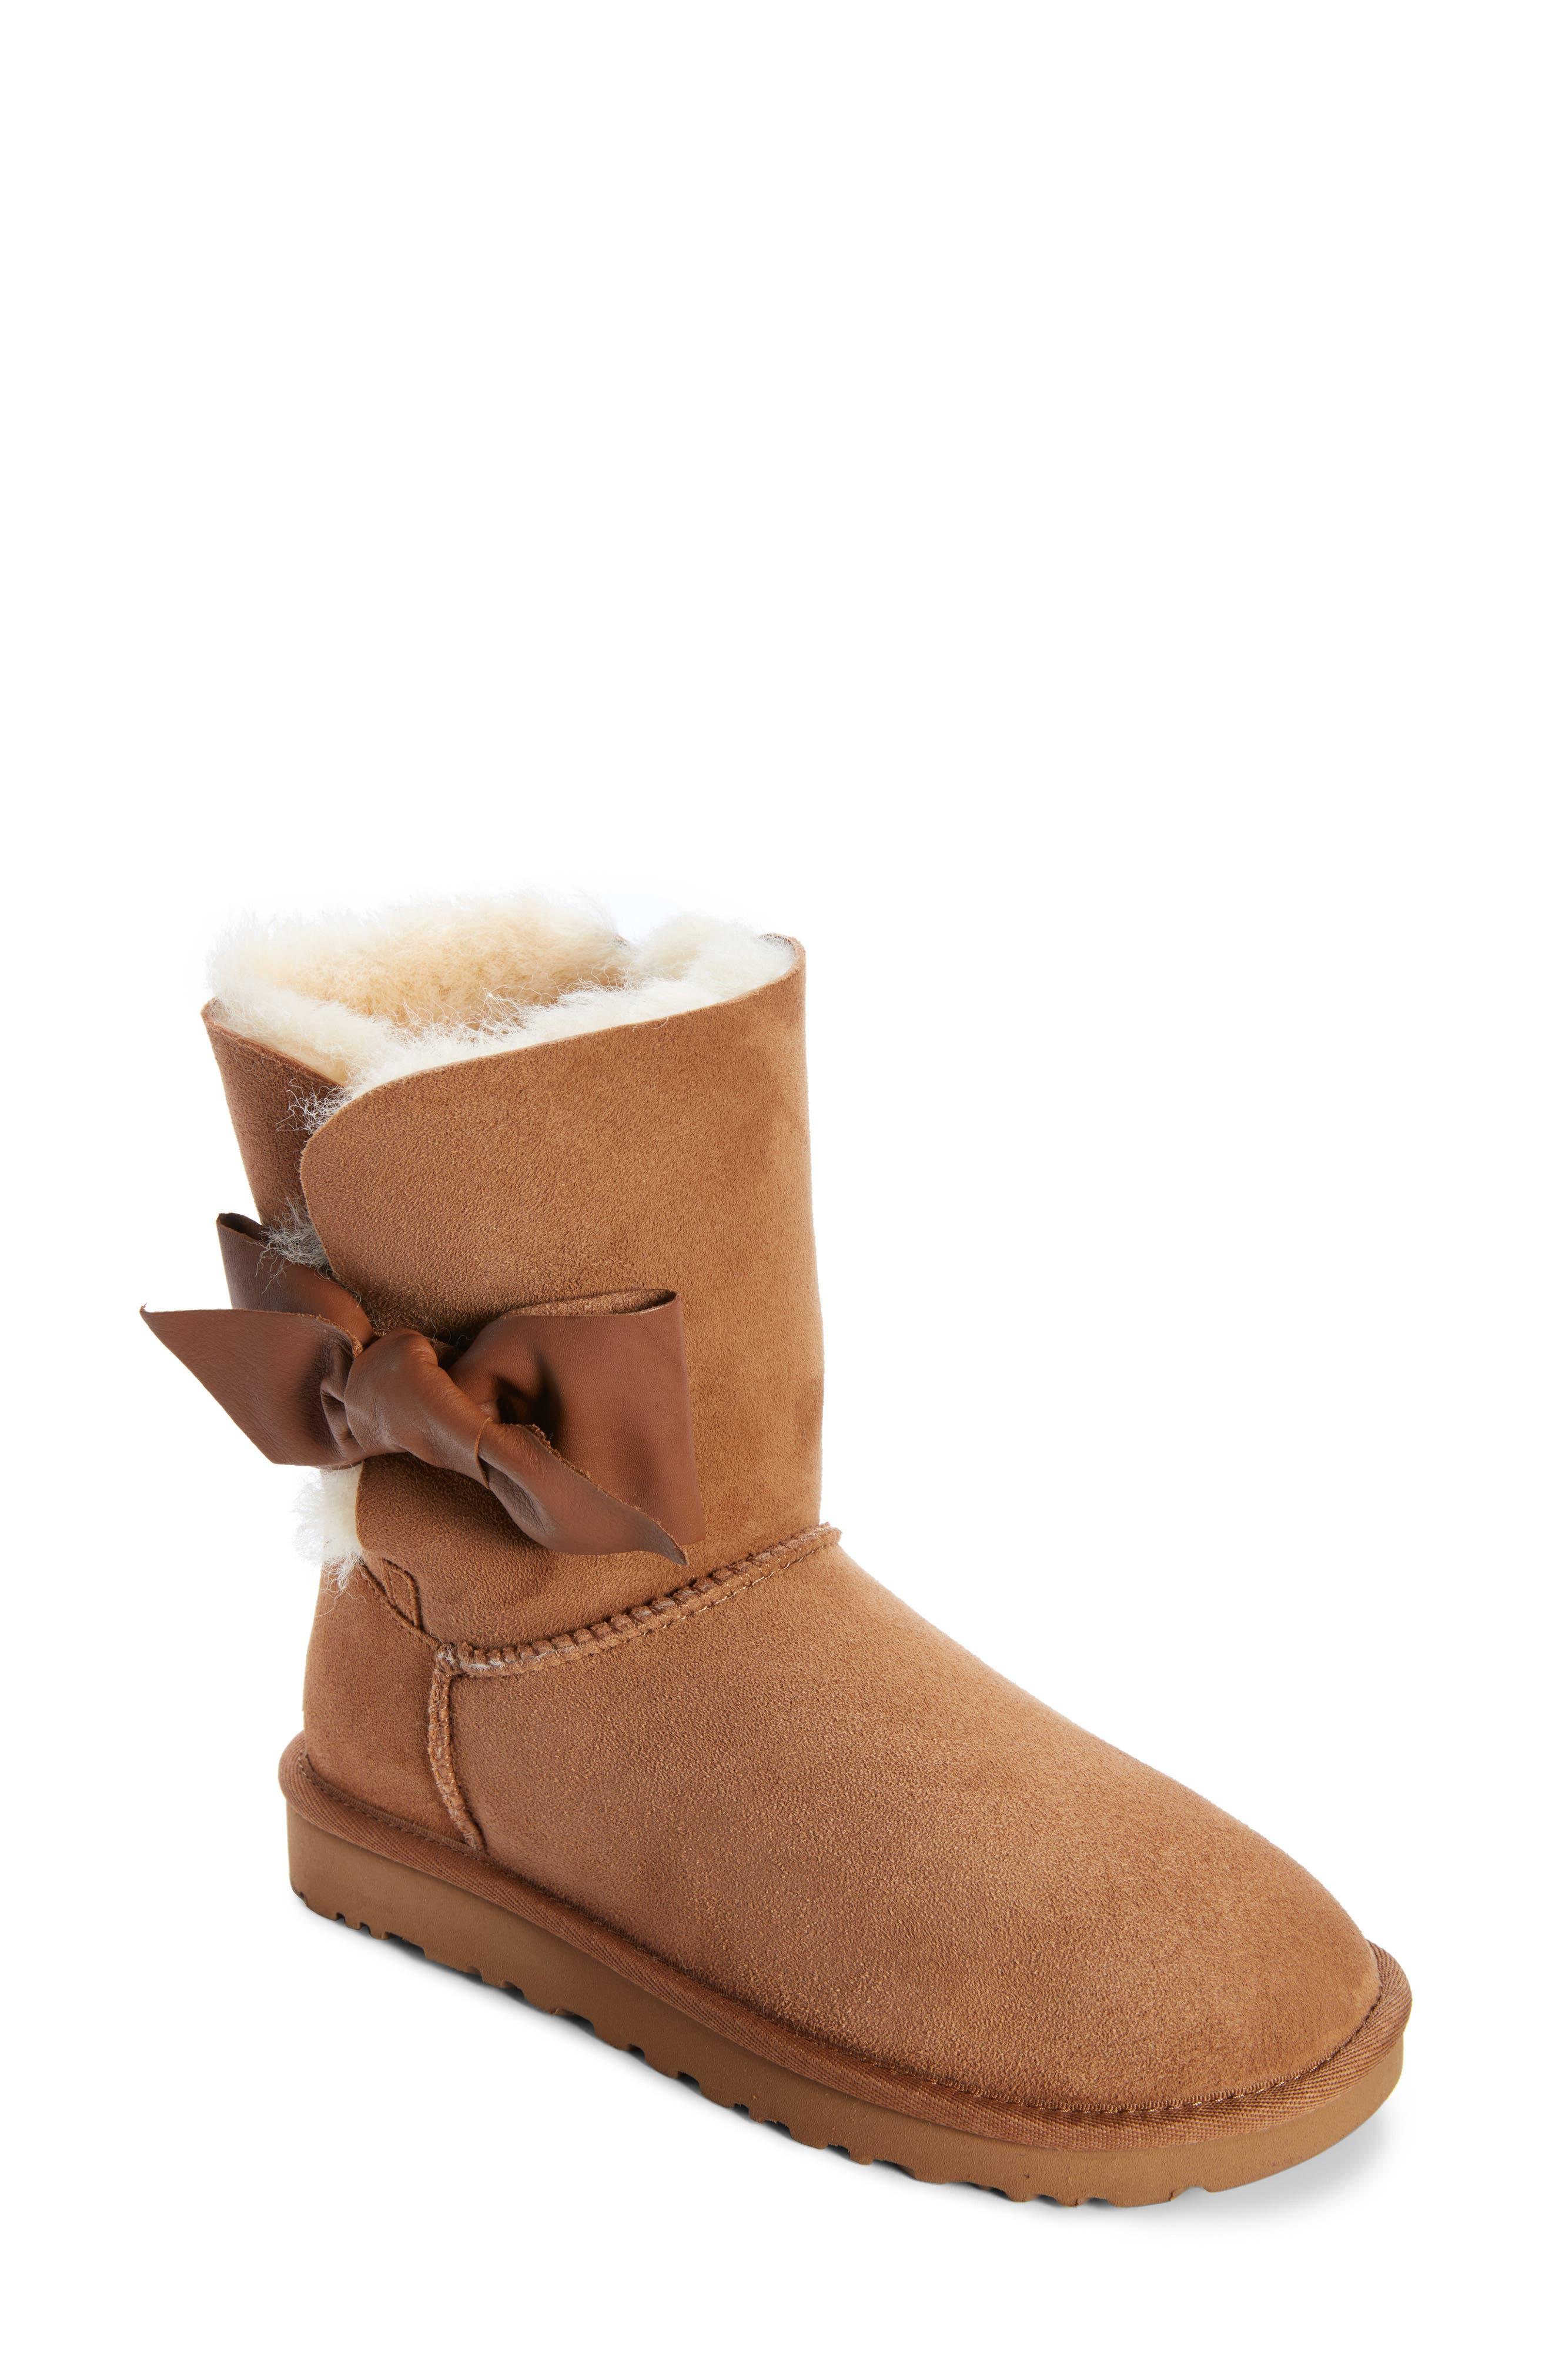 Ugg Daelynn Boot, Brown